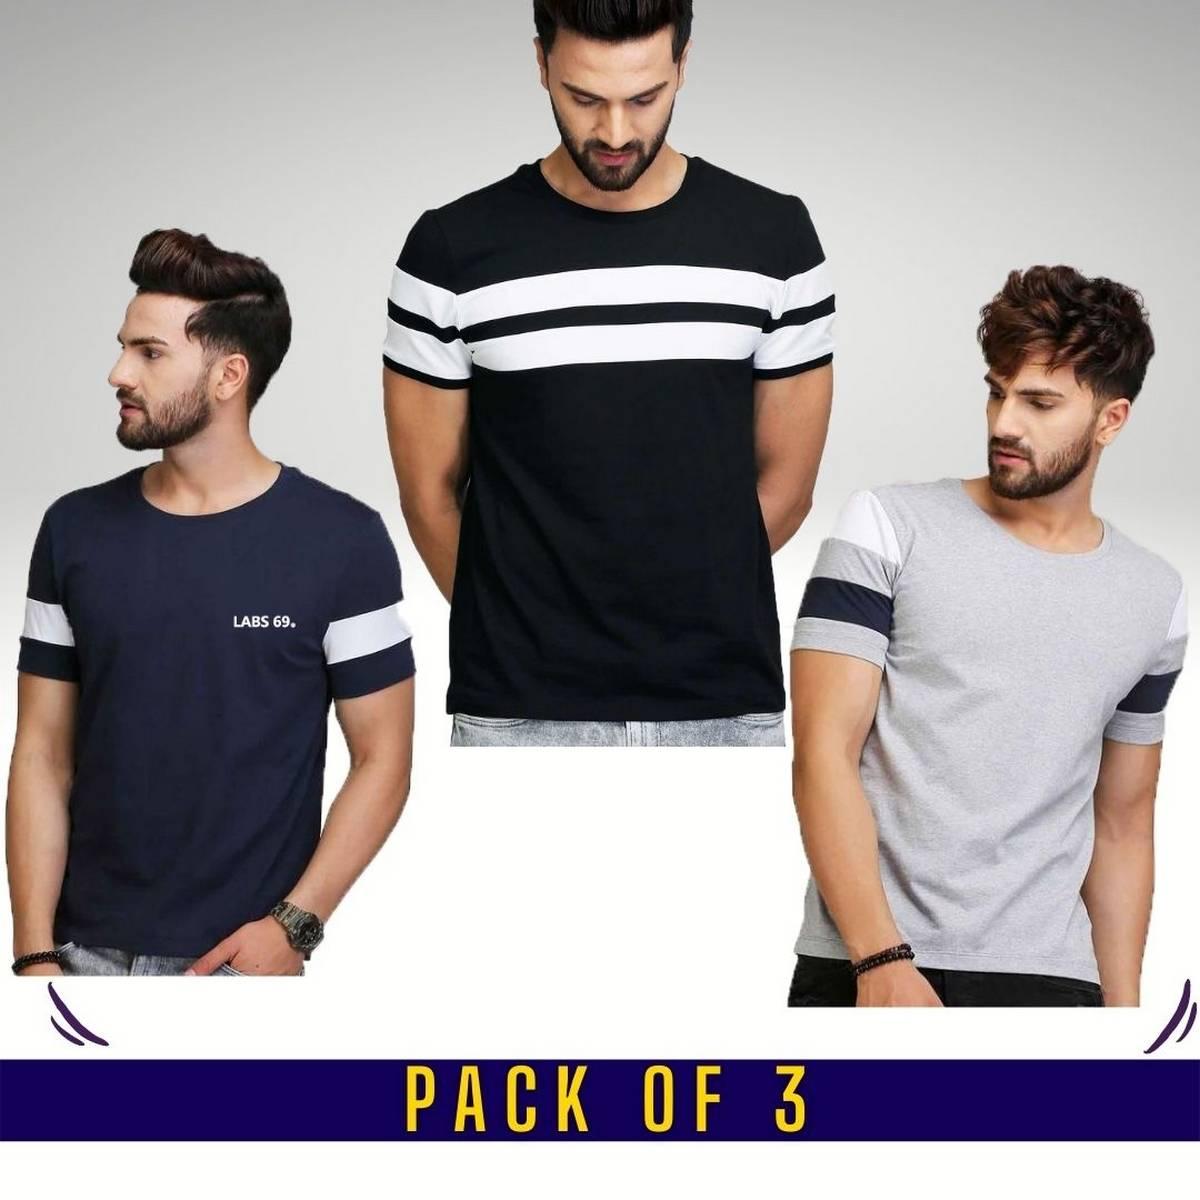 High Quality Pack of 3 Half Sleeves Designer T-shirts For Men For Summer